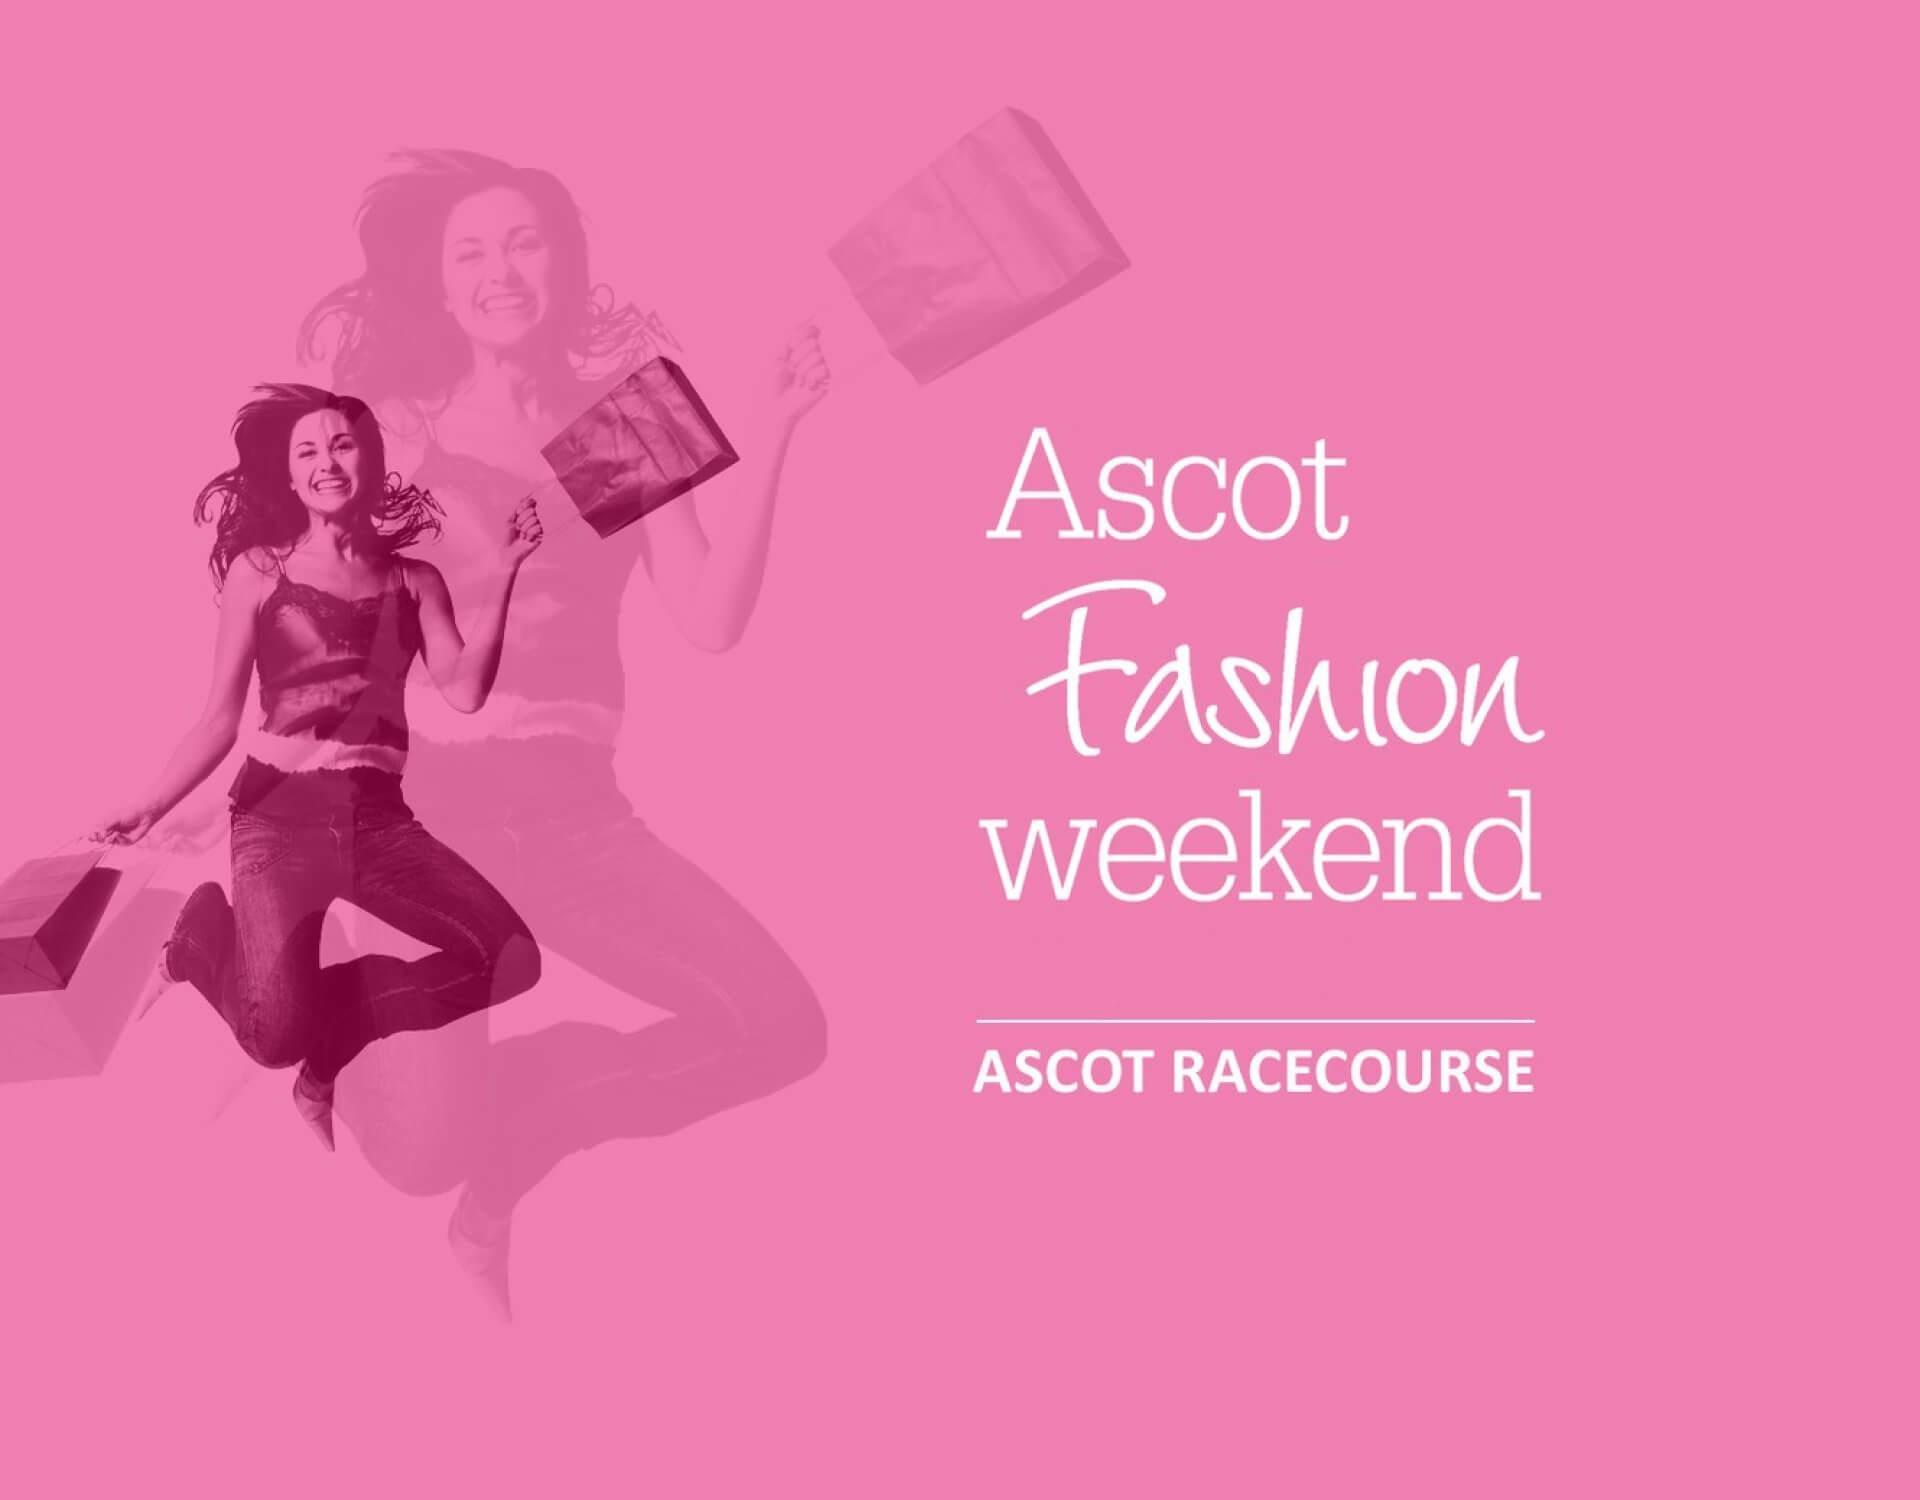 Ascot Fashion Weekend